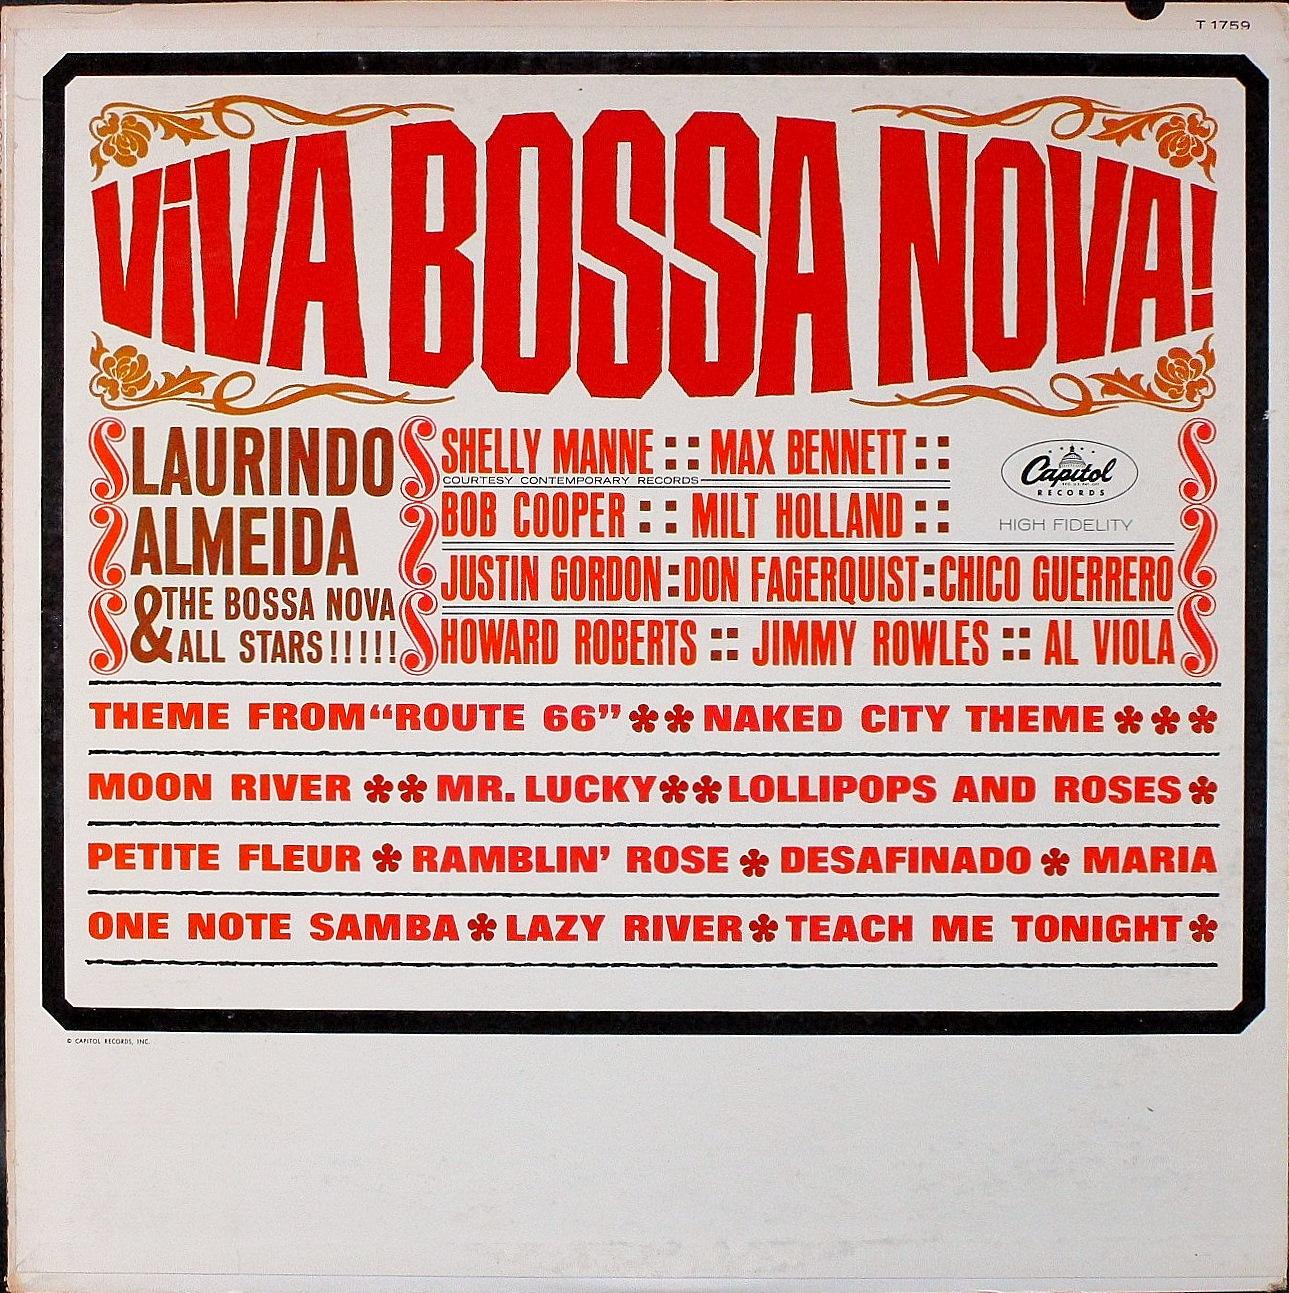 Laurindo Almeida & The Bossa Nova Allstars ローリンド・アルメイダ&ボサノヴァ・オールスターズ / Viva Bossa Nova!